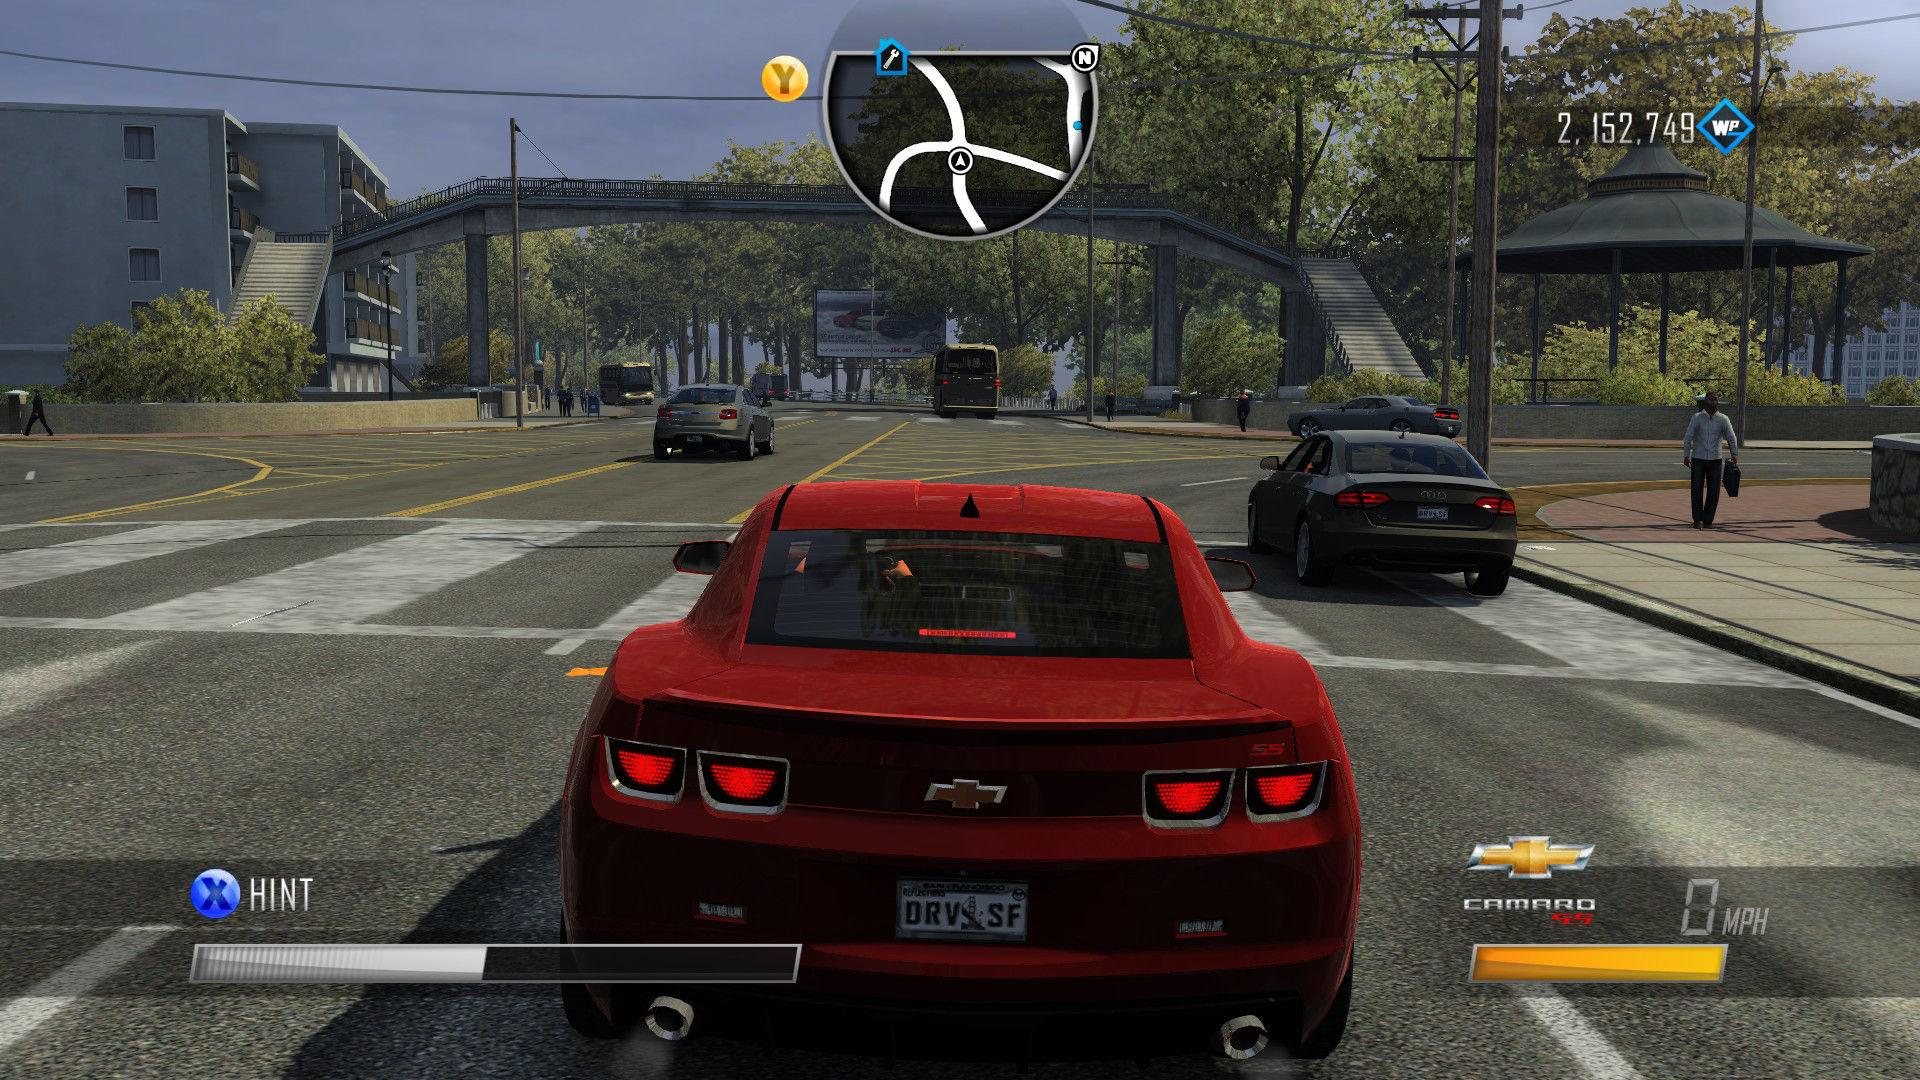 Free crack softwares downoad: driver san francisco game.